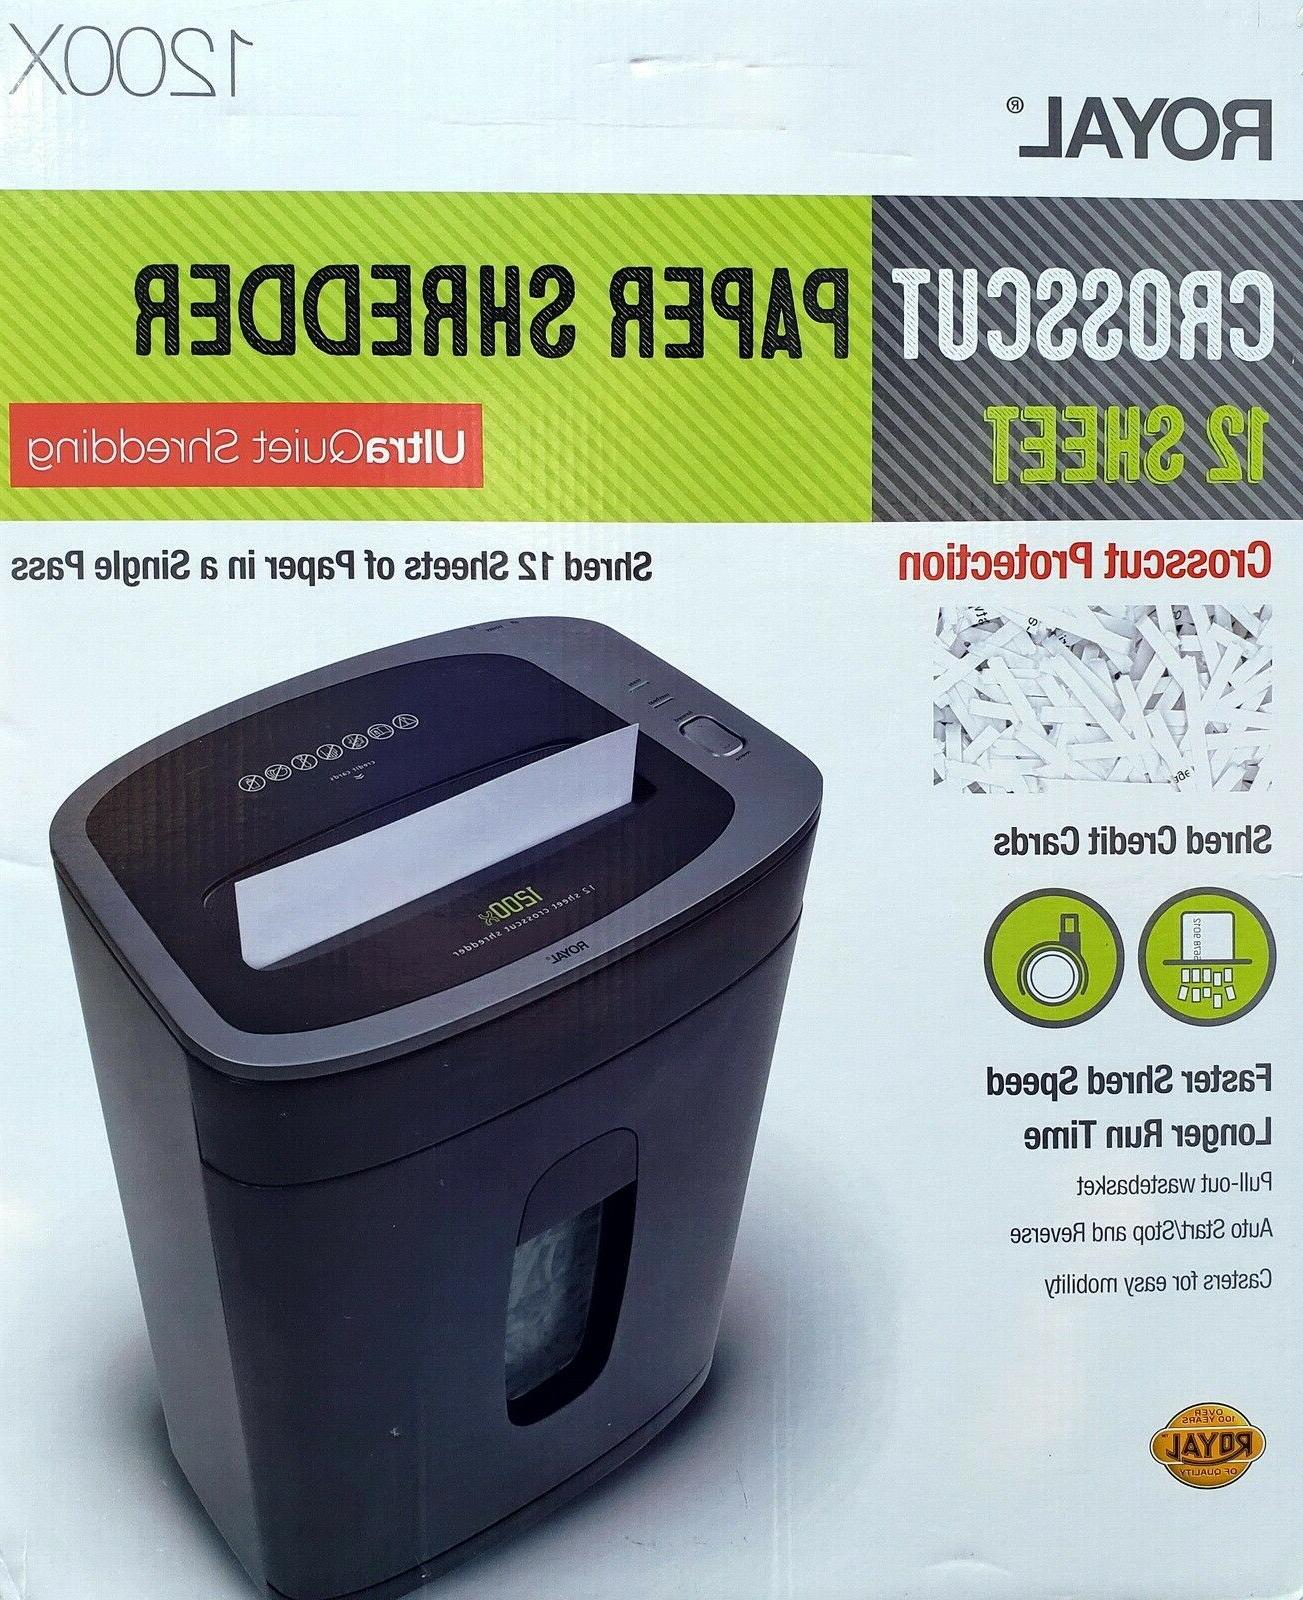 Royal 12 Sheet Paper Shredder Heavy Duty Cross Cut Ultra Qui